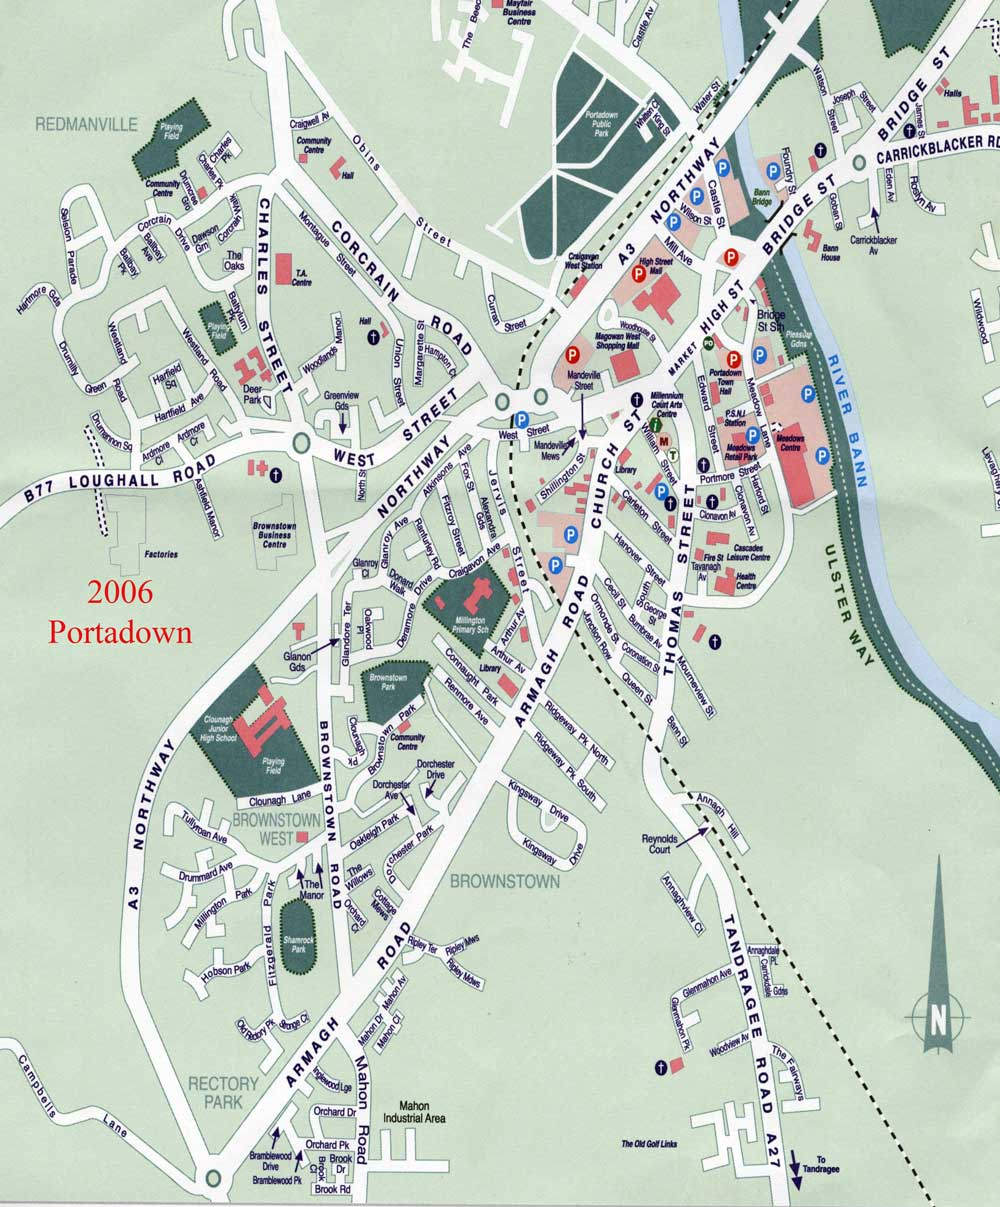 Maps of Portadown